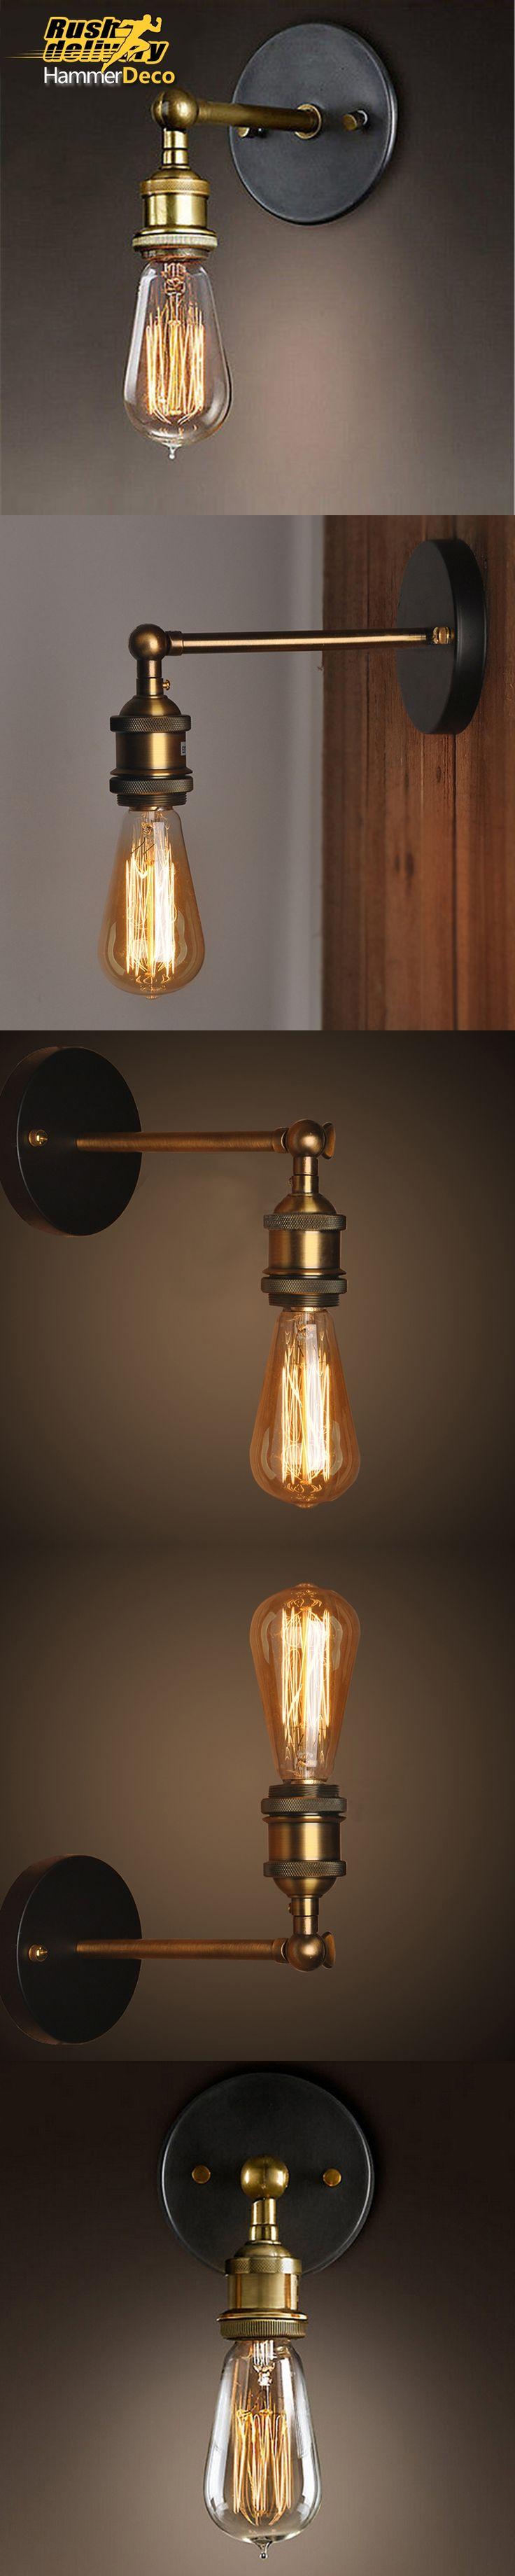 Best 25 Edison lighting bedroom ideas on Pinterest